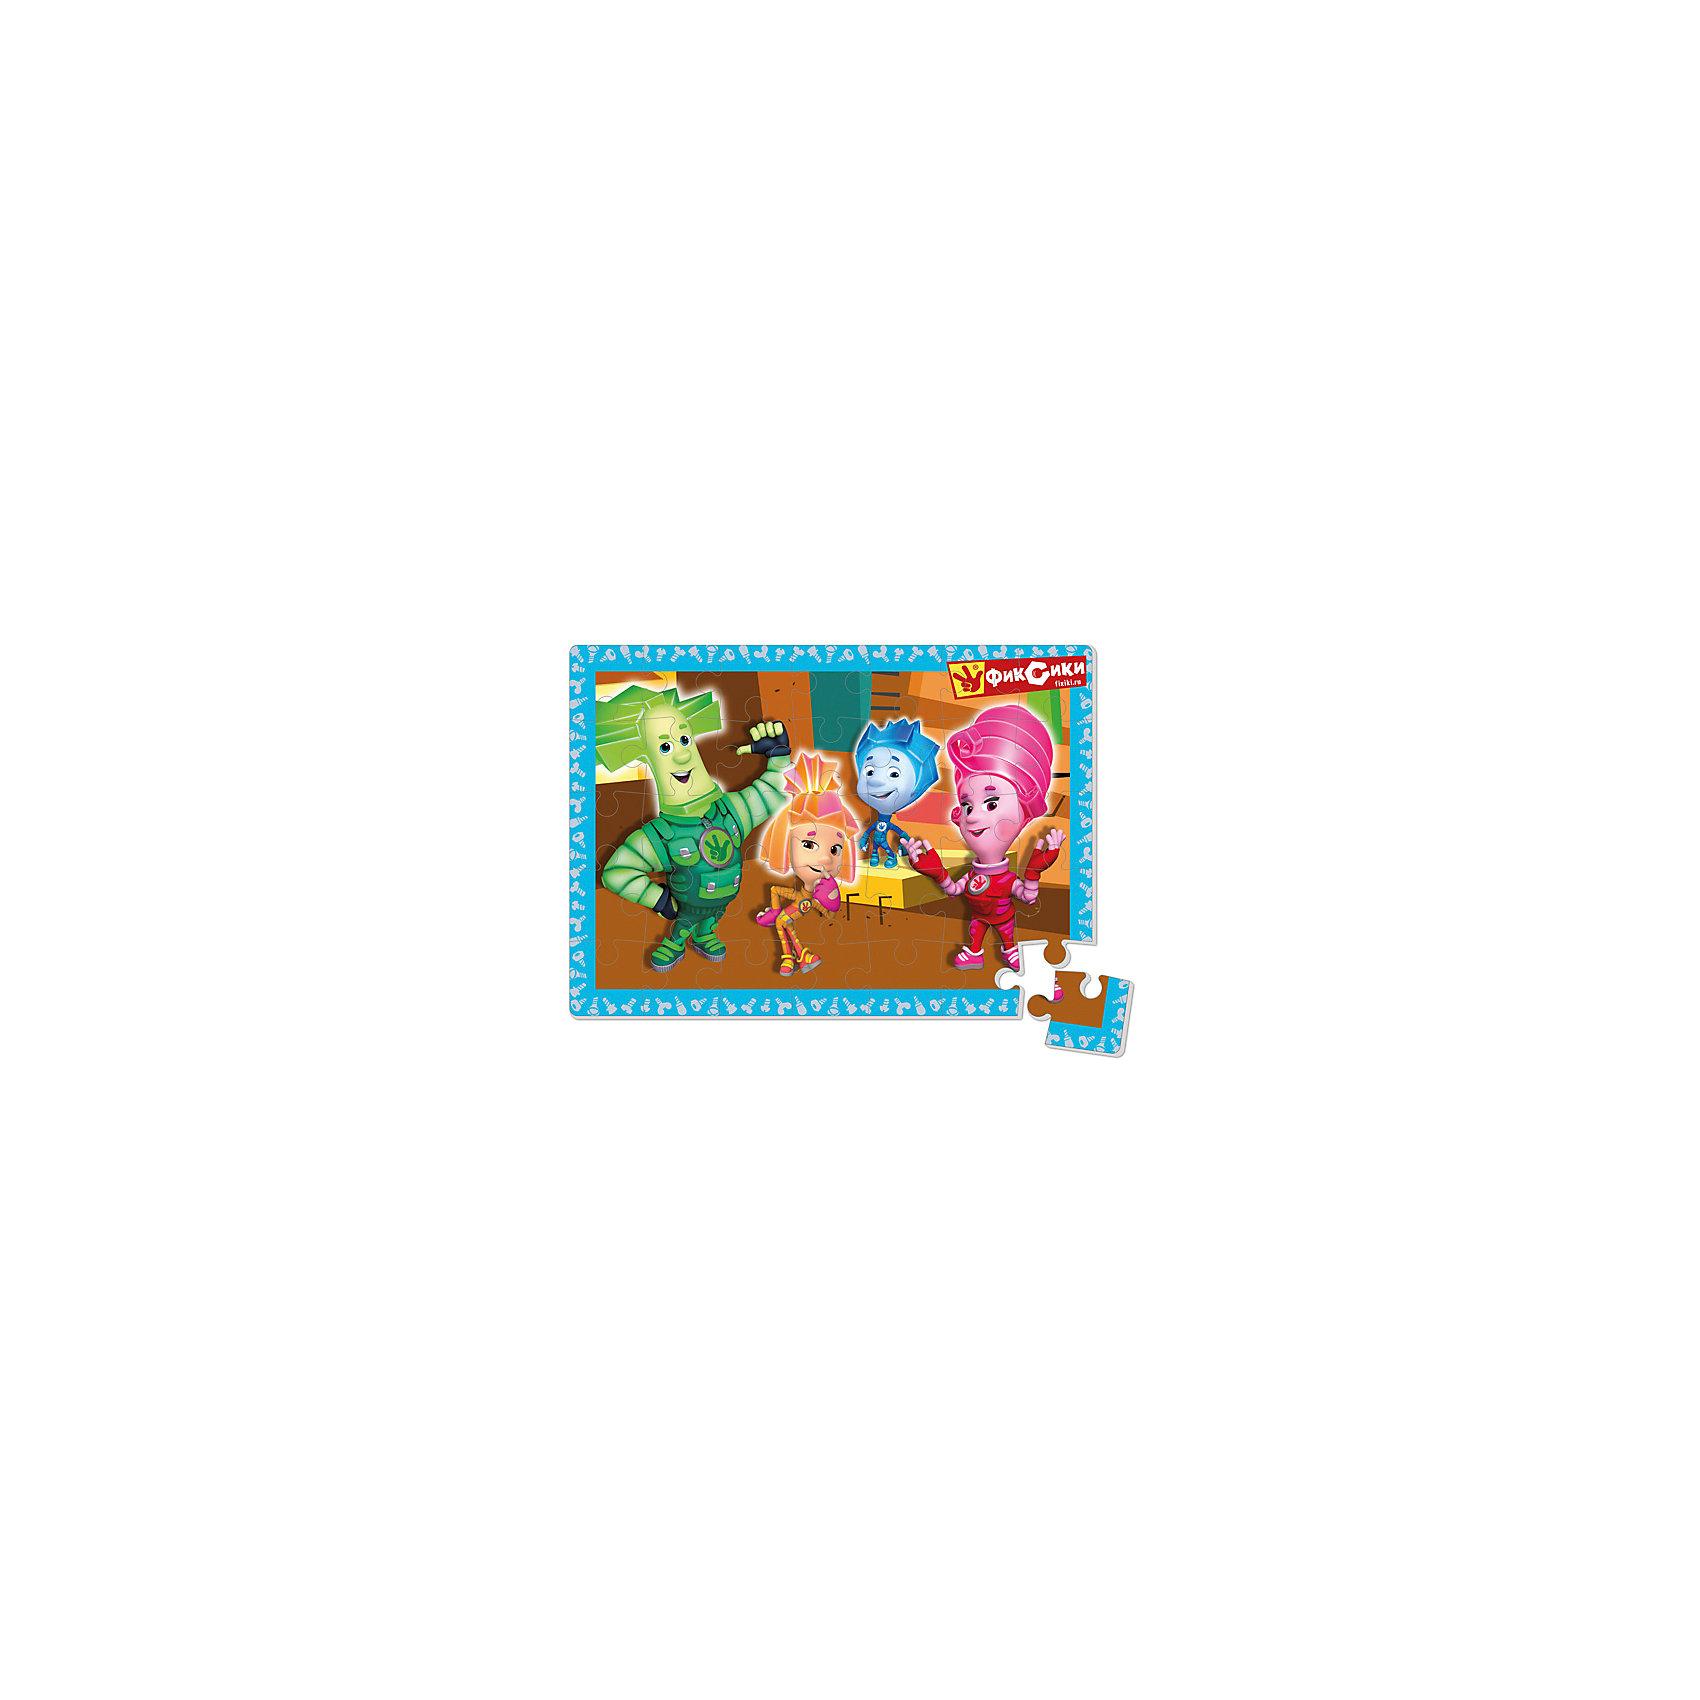 Vladi Toys Мягкие пазлы А4 Фиксики, в коробке, Vladi Toys павлин мягкие пазлы